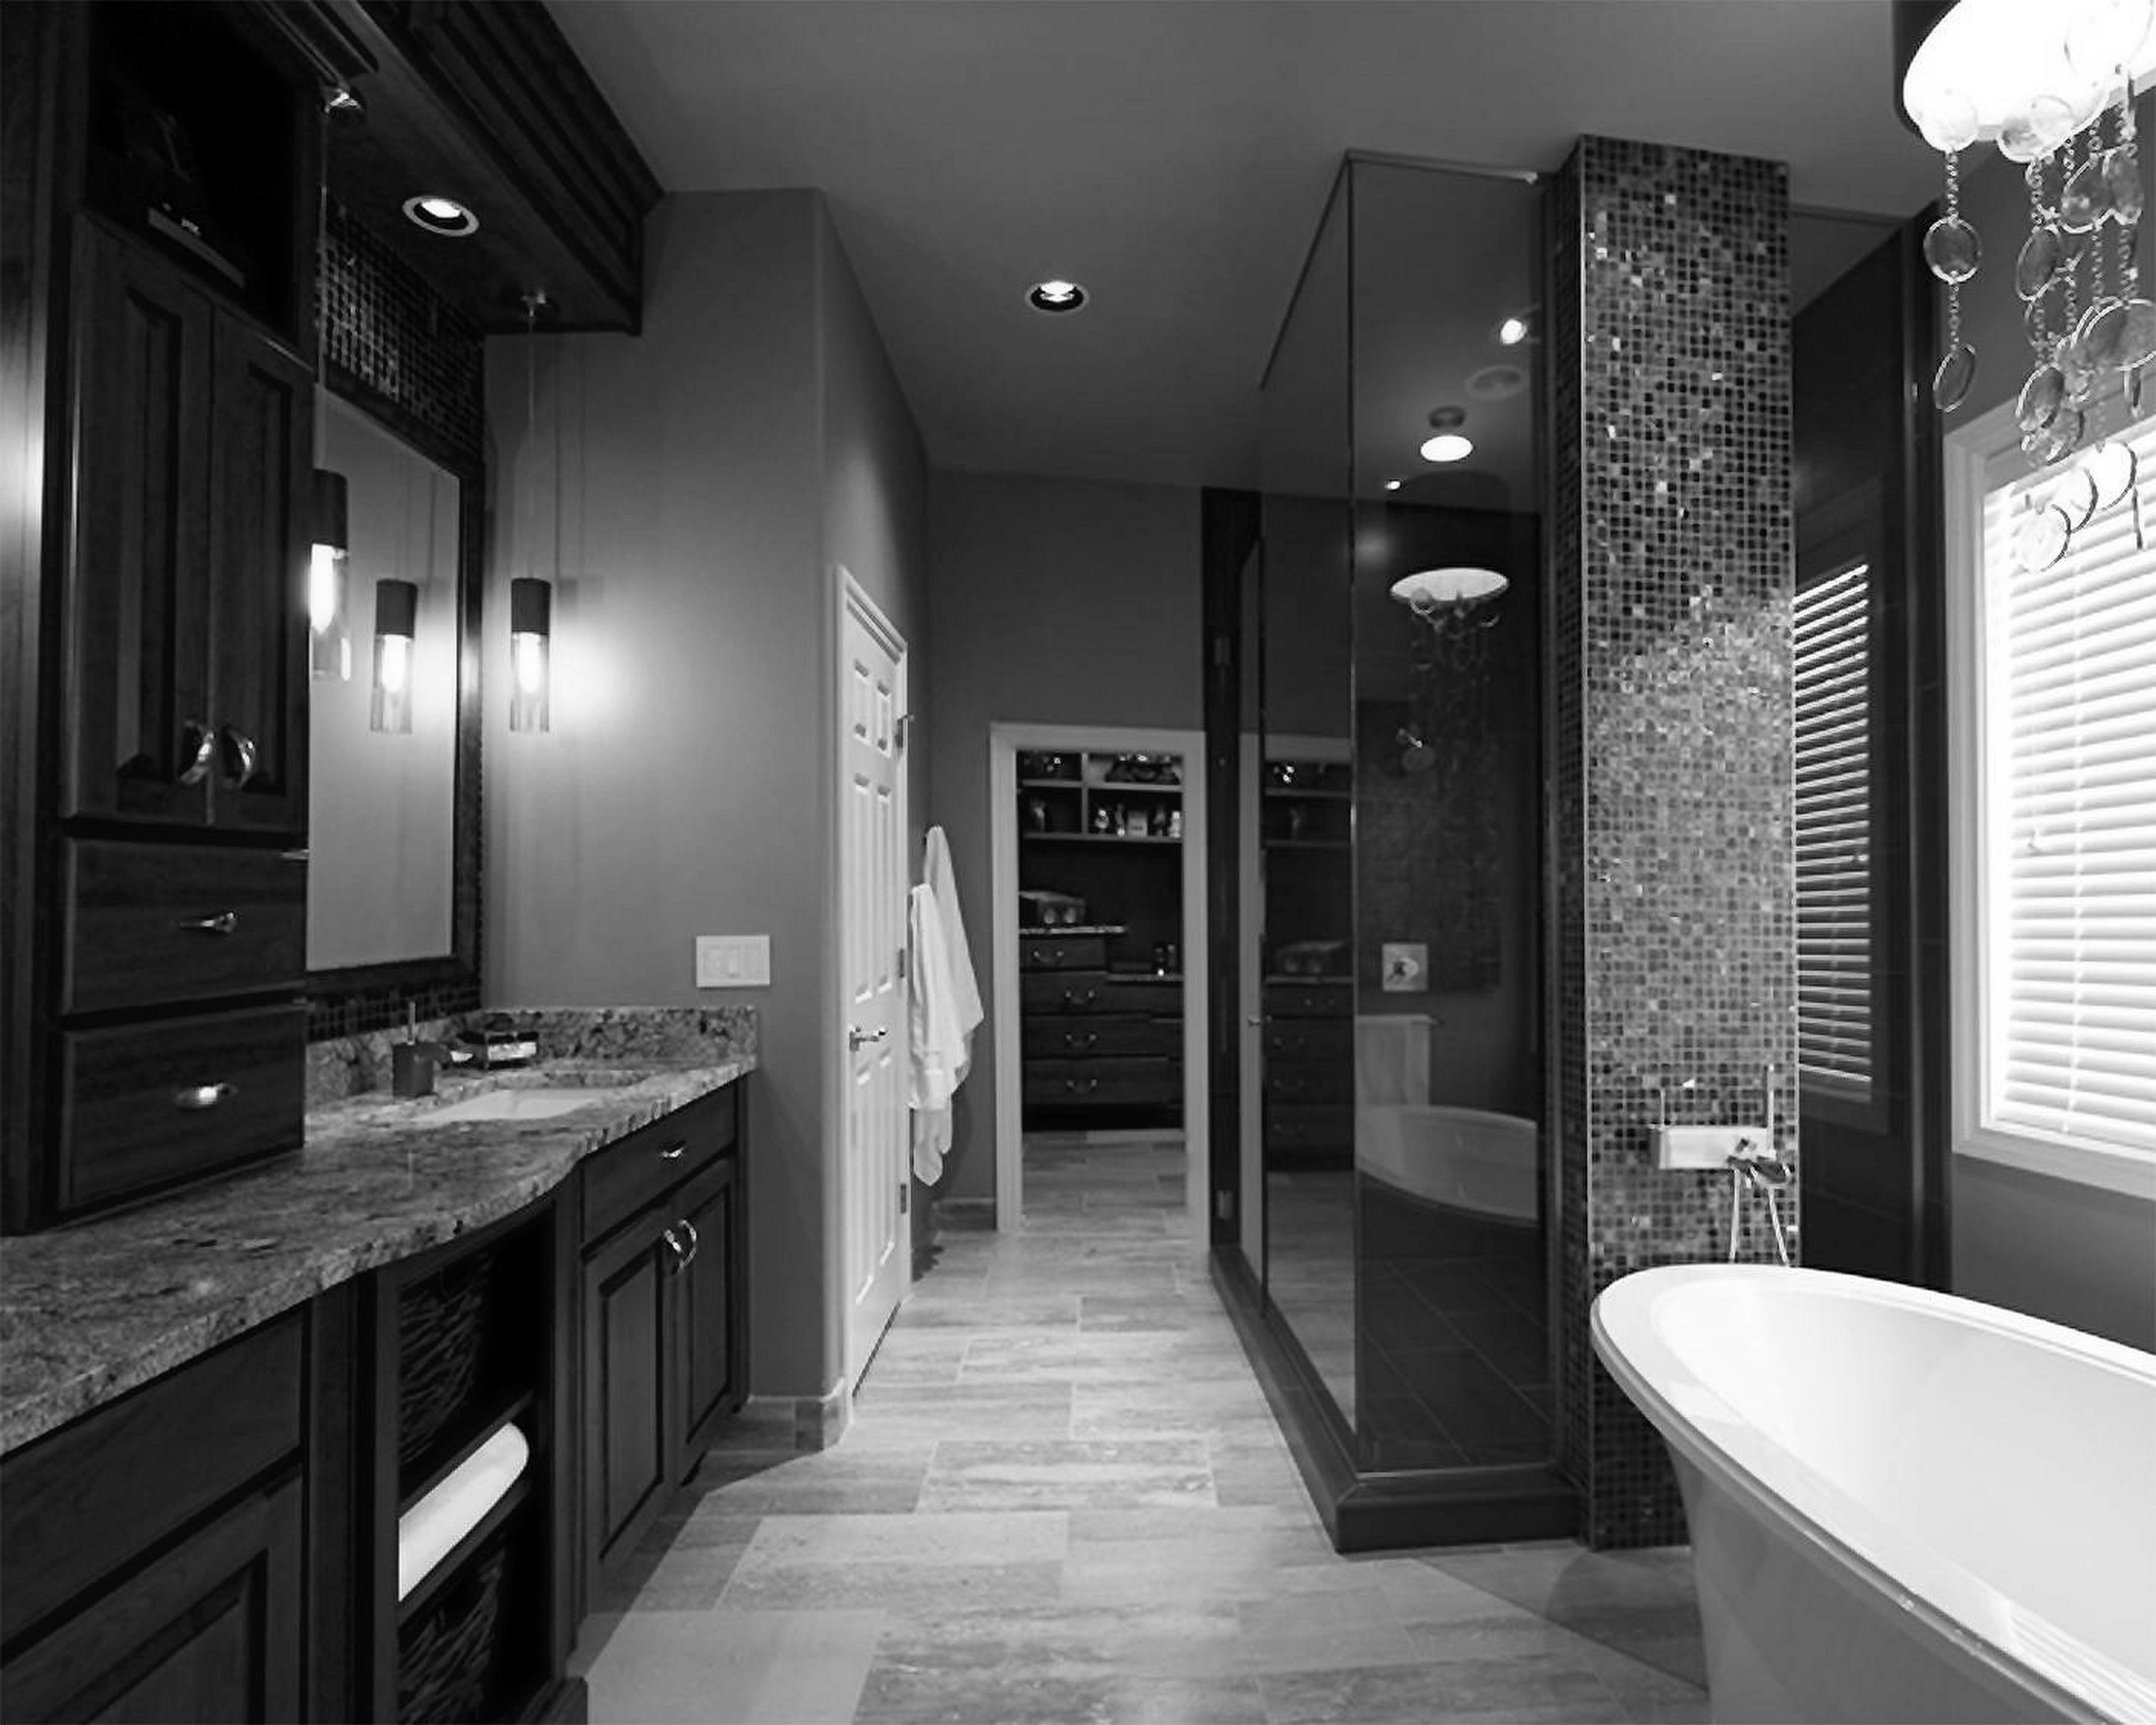 65 Best Black Bathrooms Interior Ideas For Cool Bathroom Design Freshouz Com Bathroom Design Black White Bathroom Decor Black White Bathrooms Bathroom decor ideas black